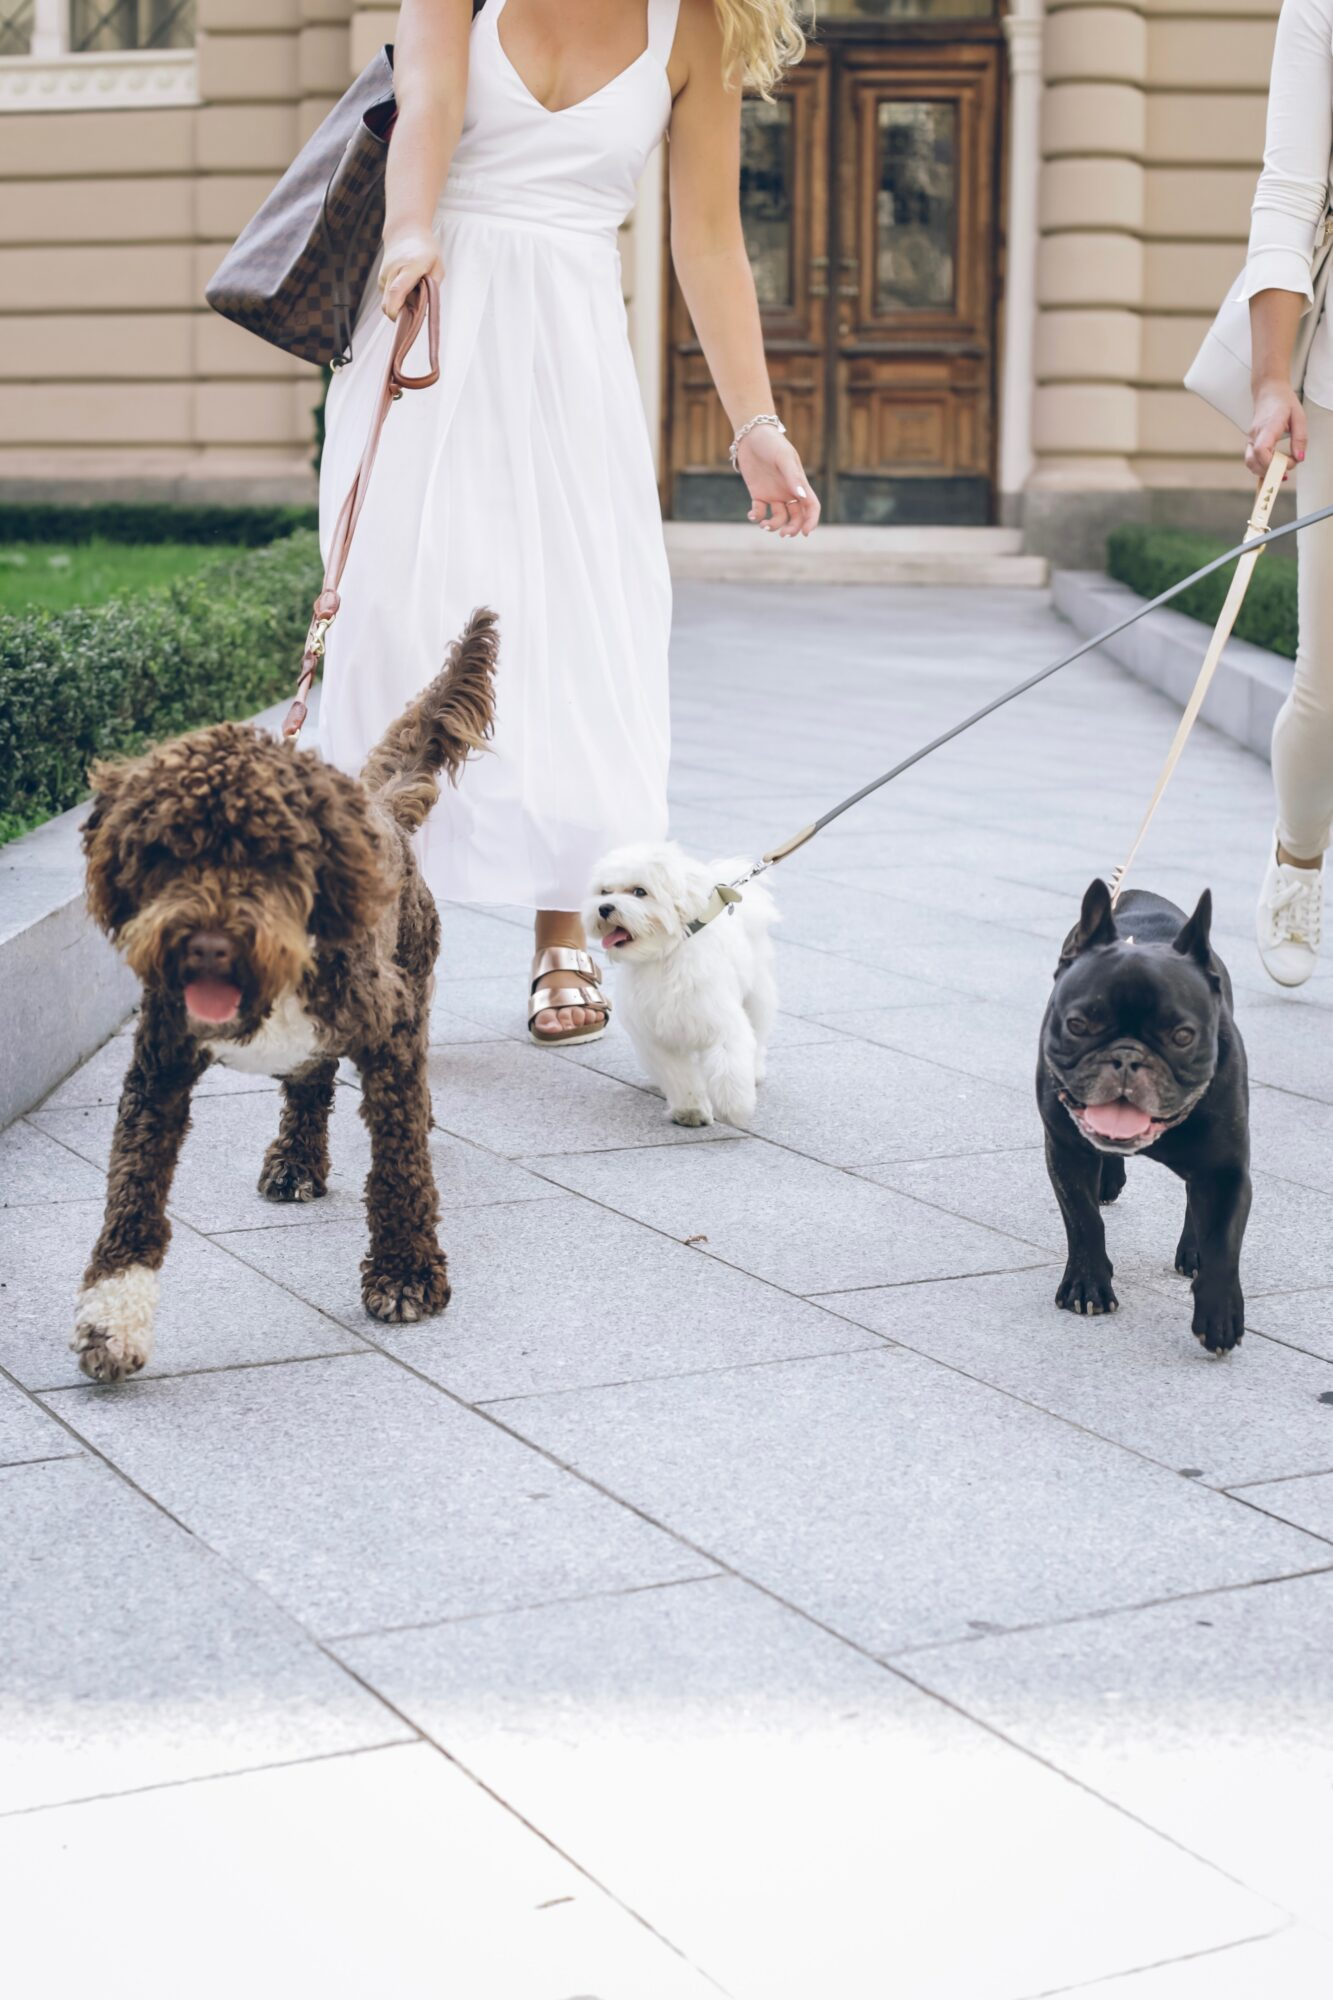 Gå behagelige ture med en din hund i hundesnor